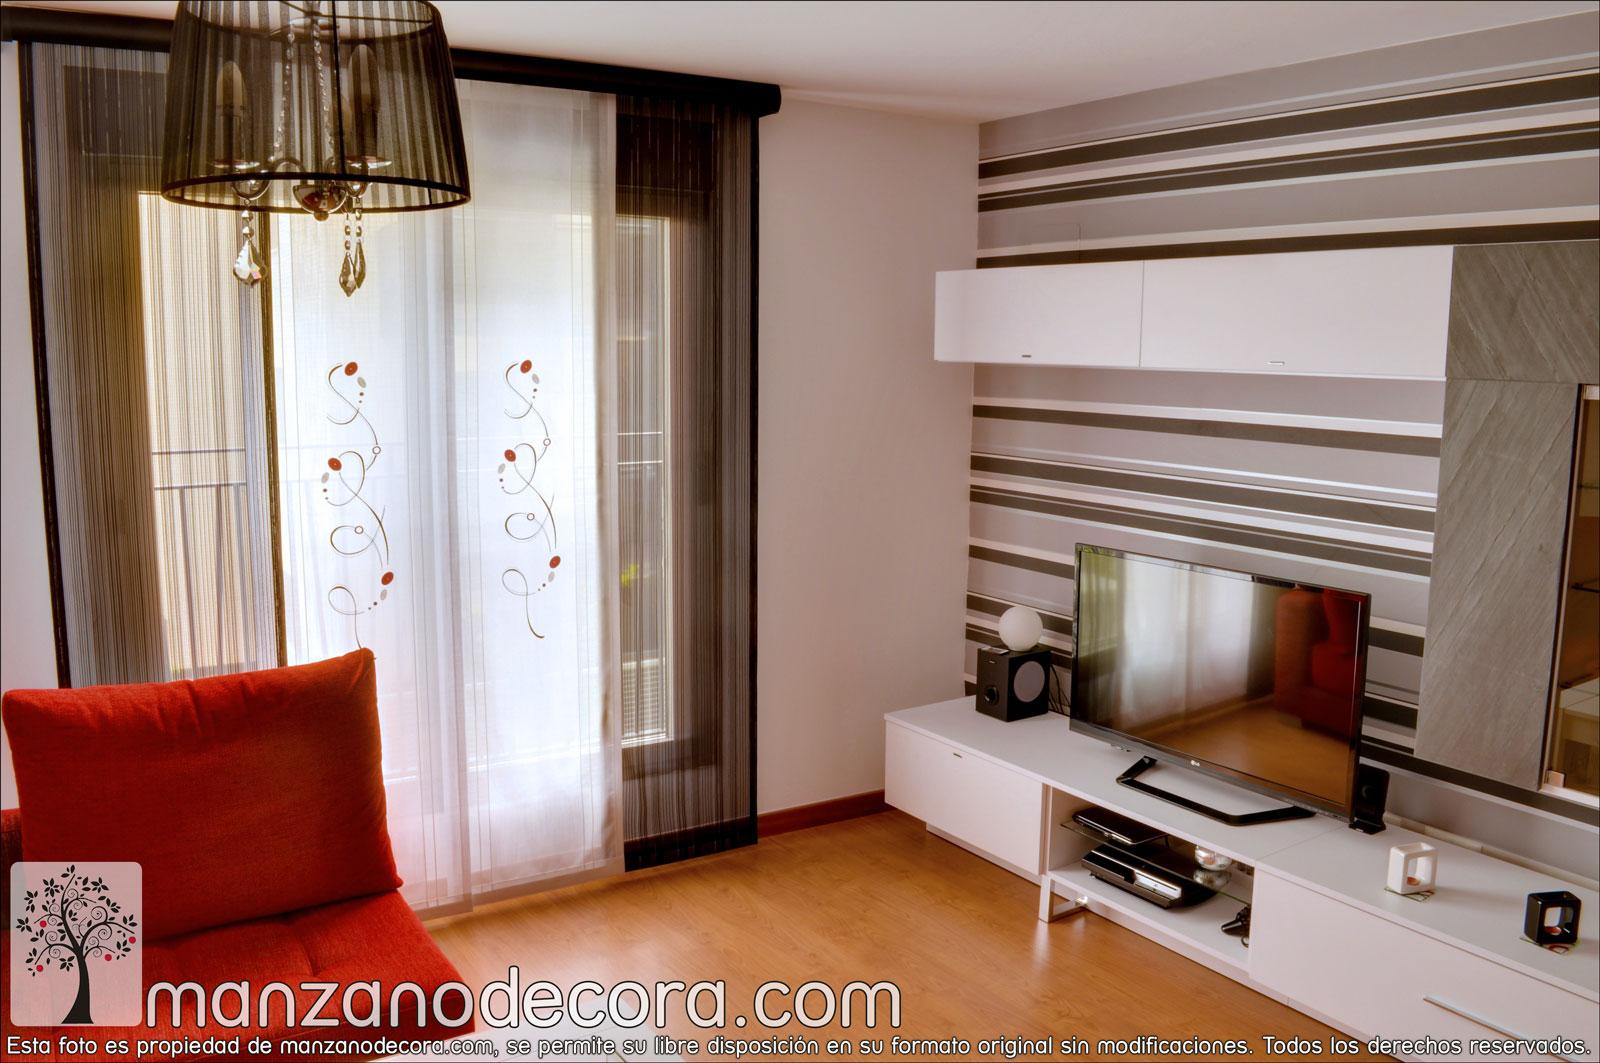 Foto de www.manzanodecora.com - Interiorismo